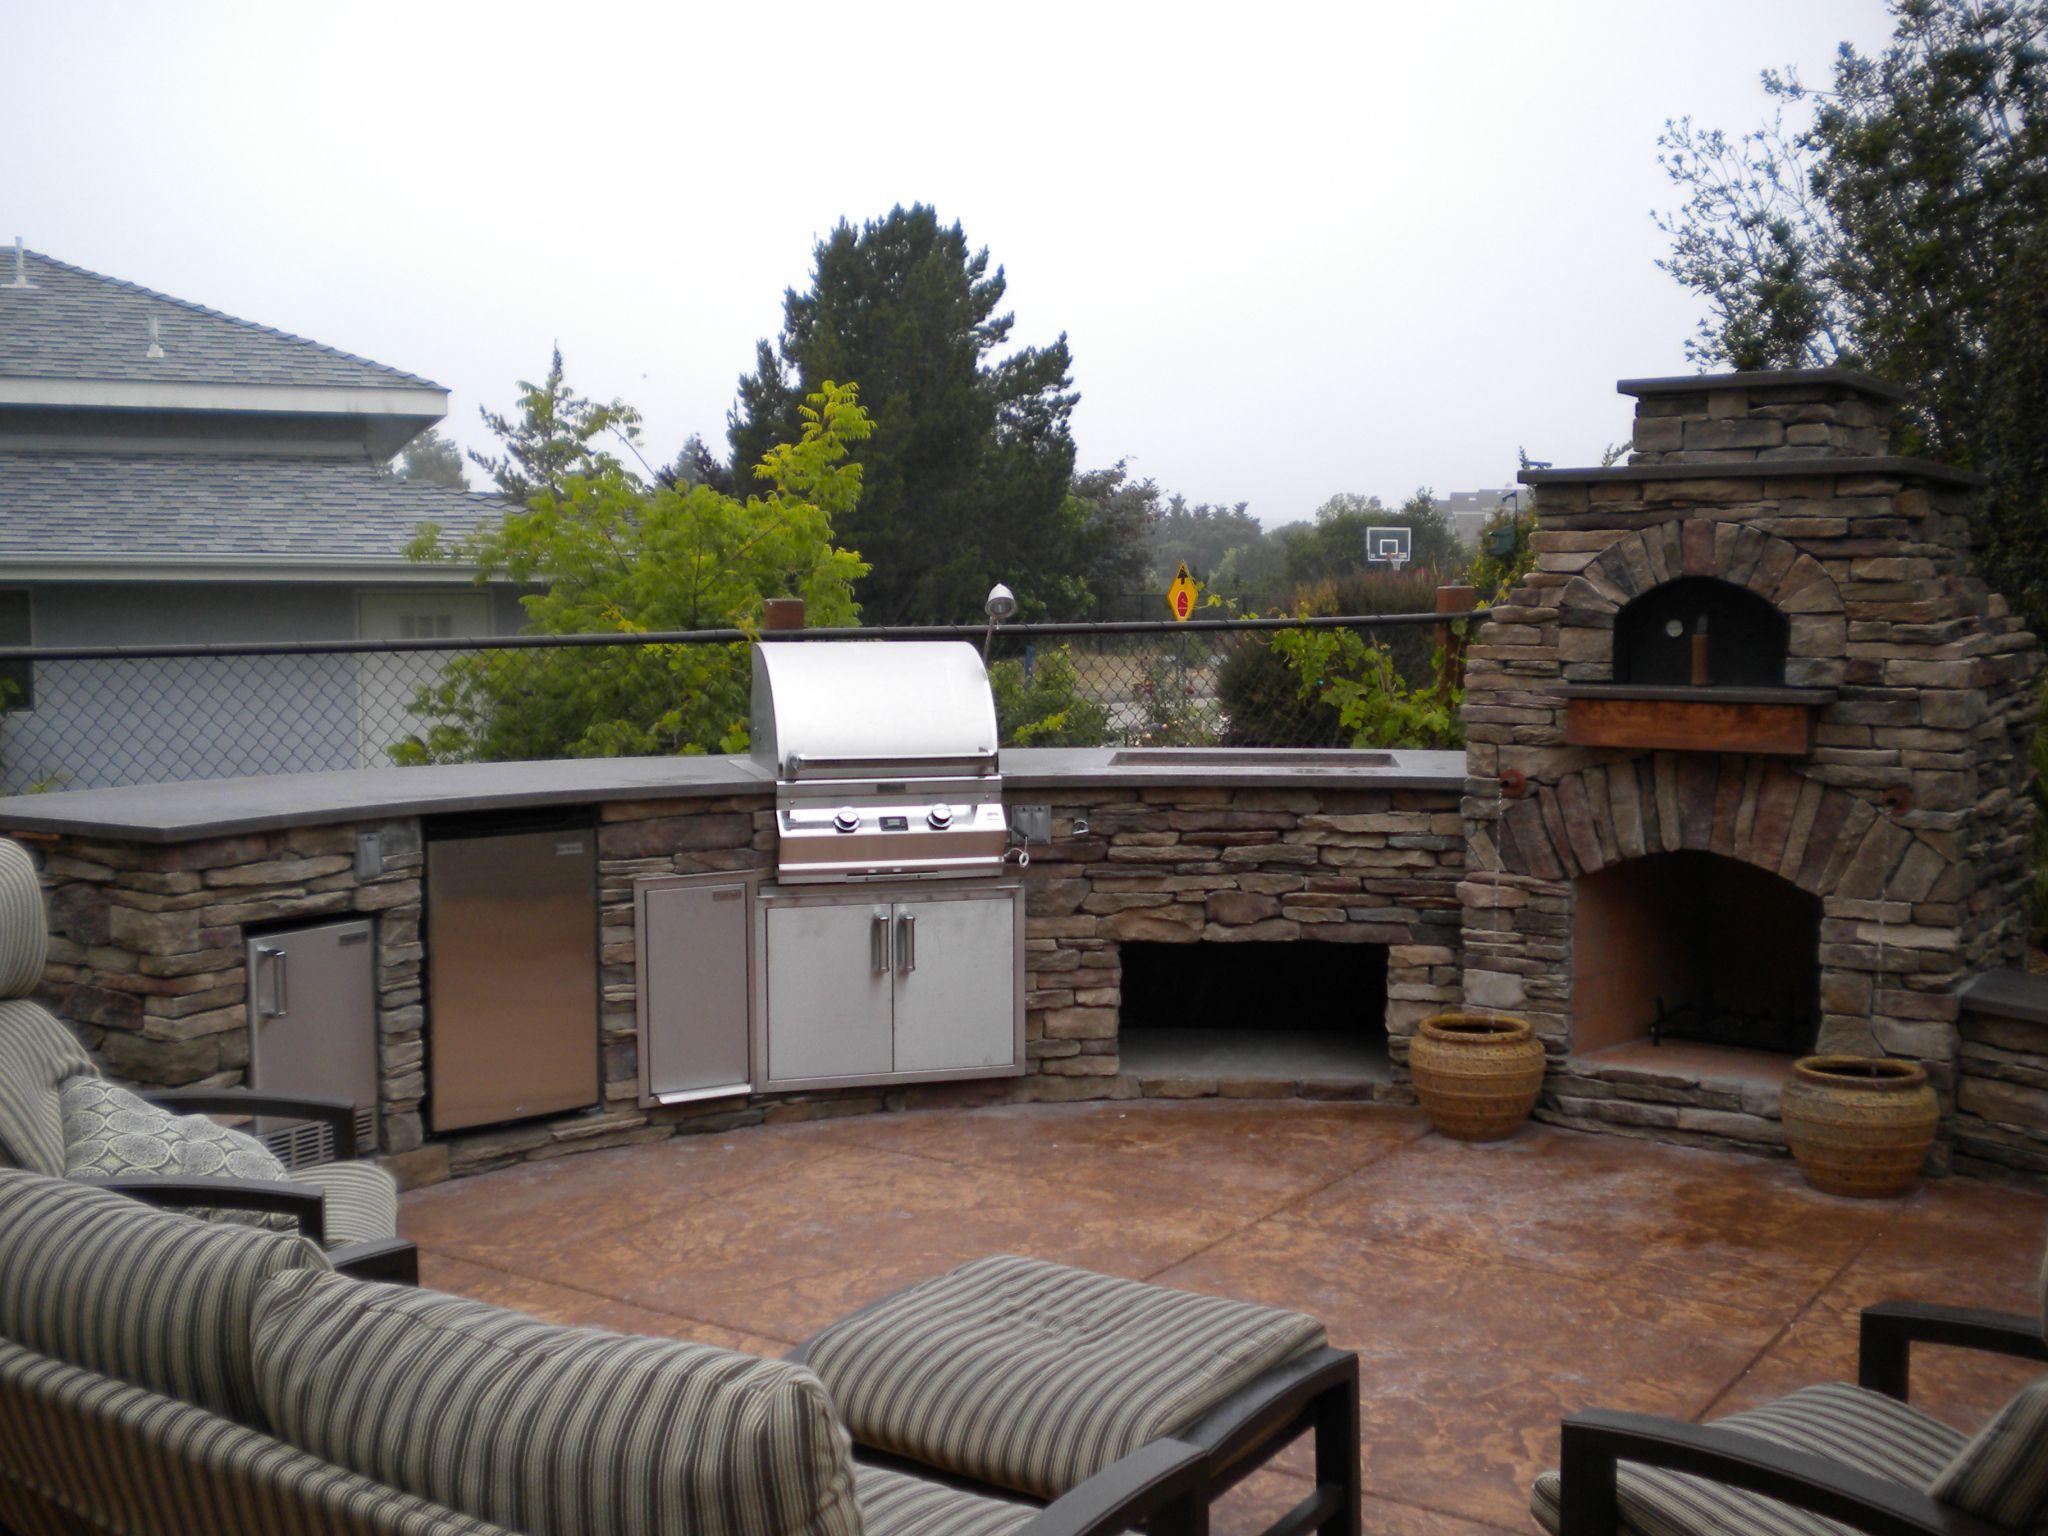 Outdoor kitchen pizza oven design favorite interior paint colors